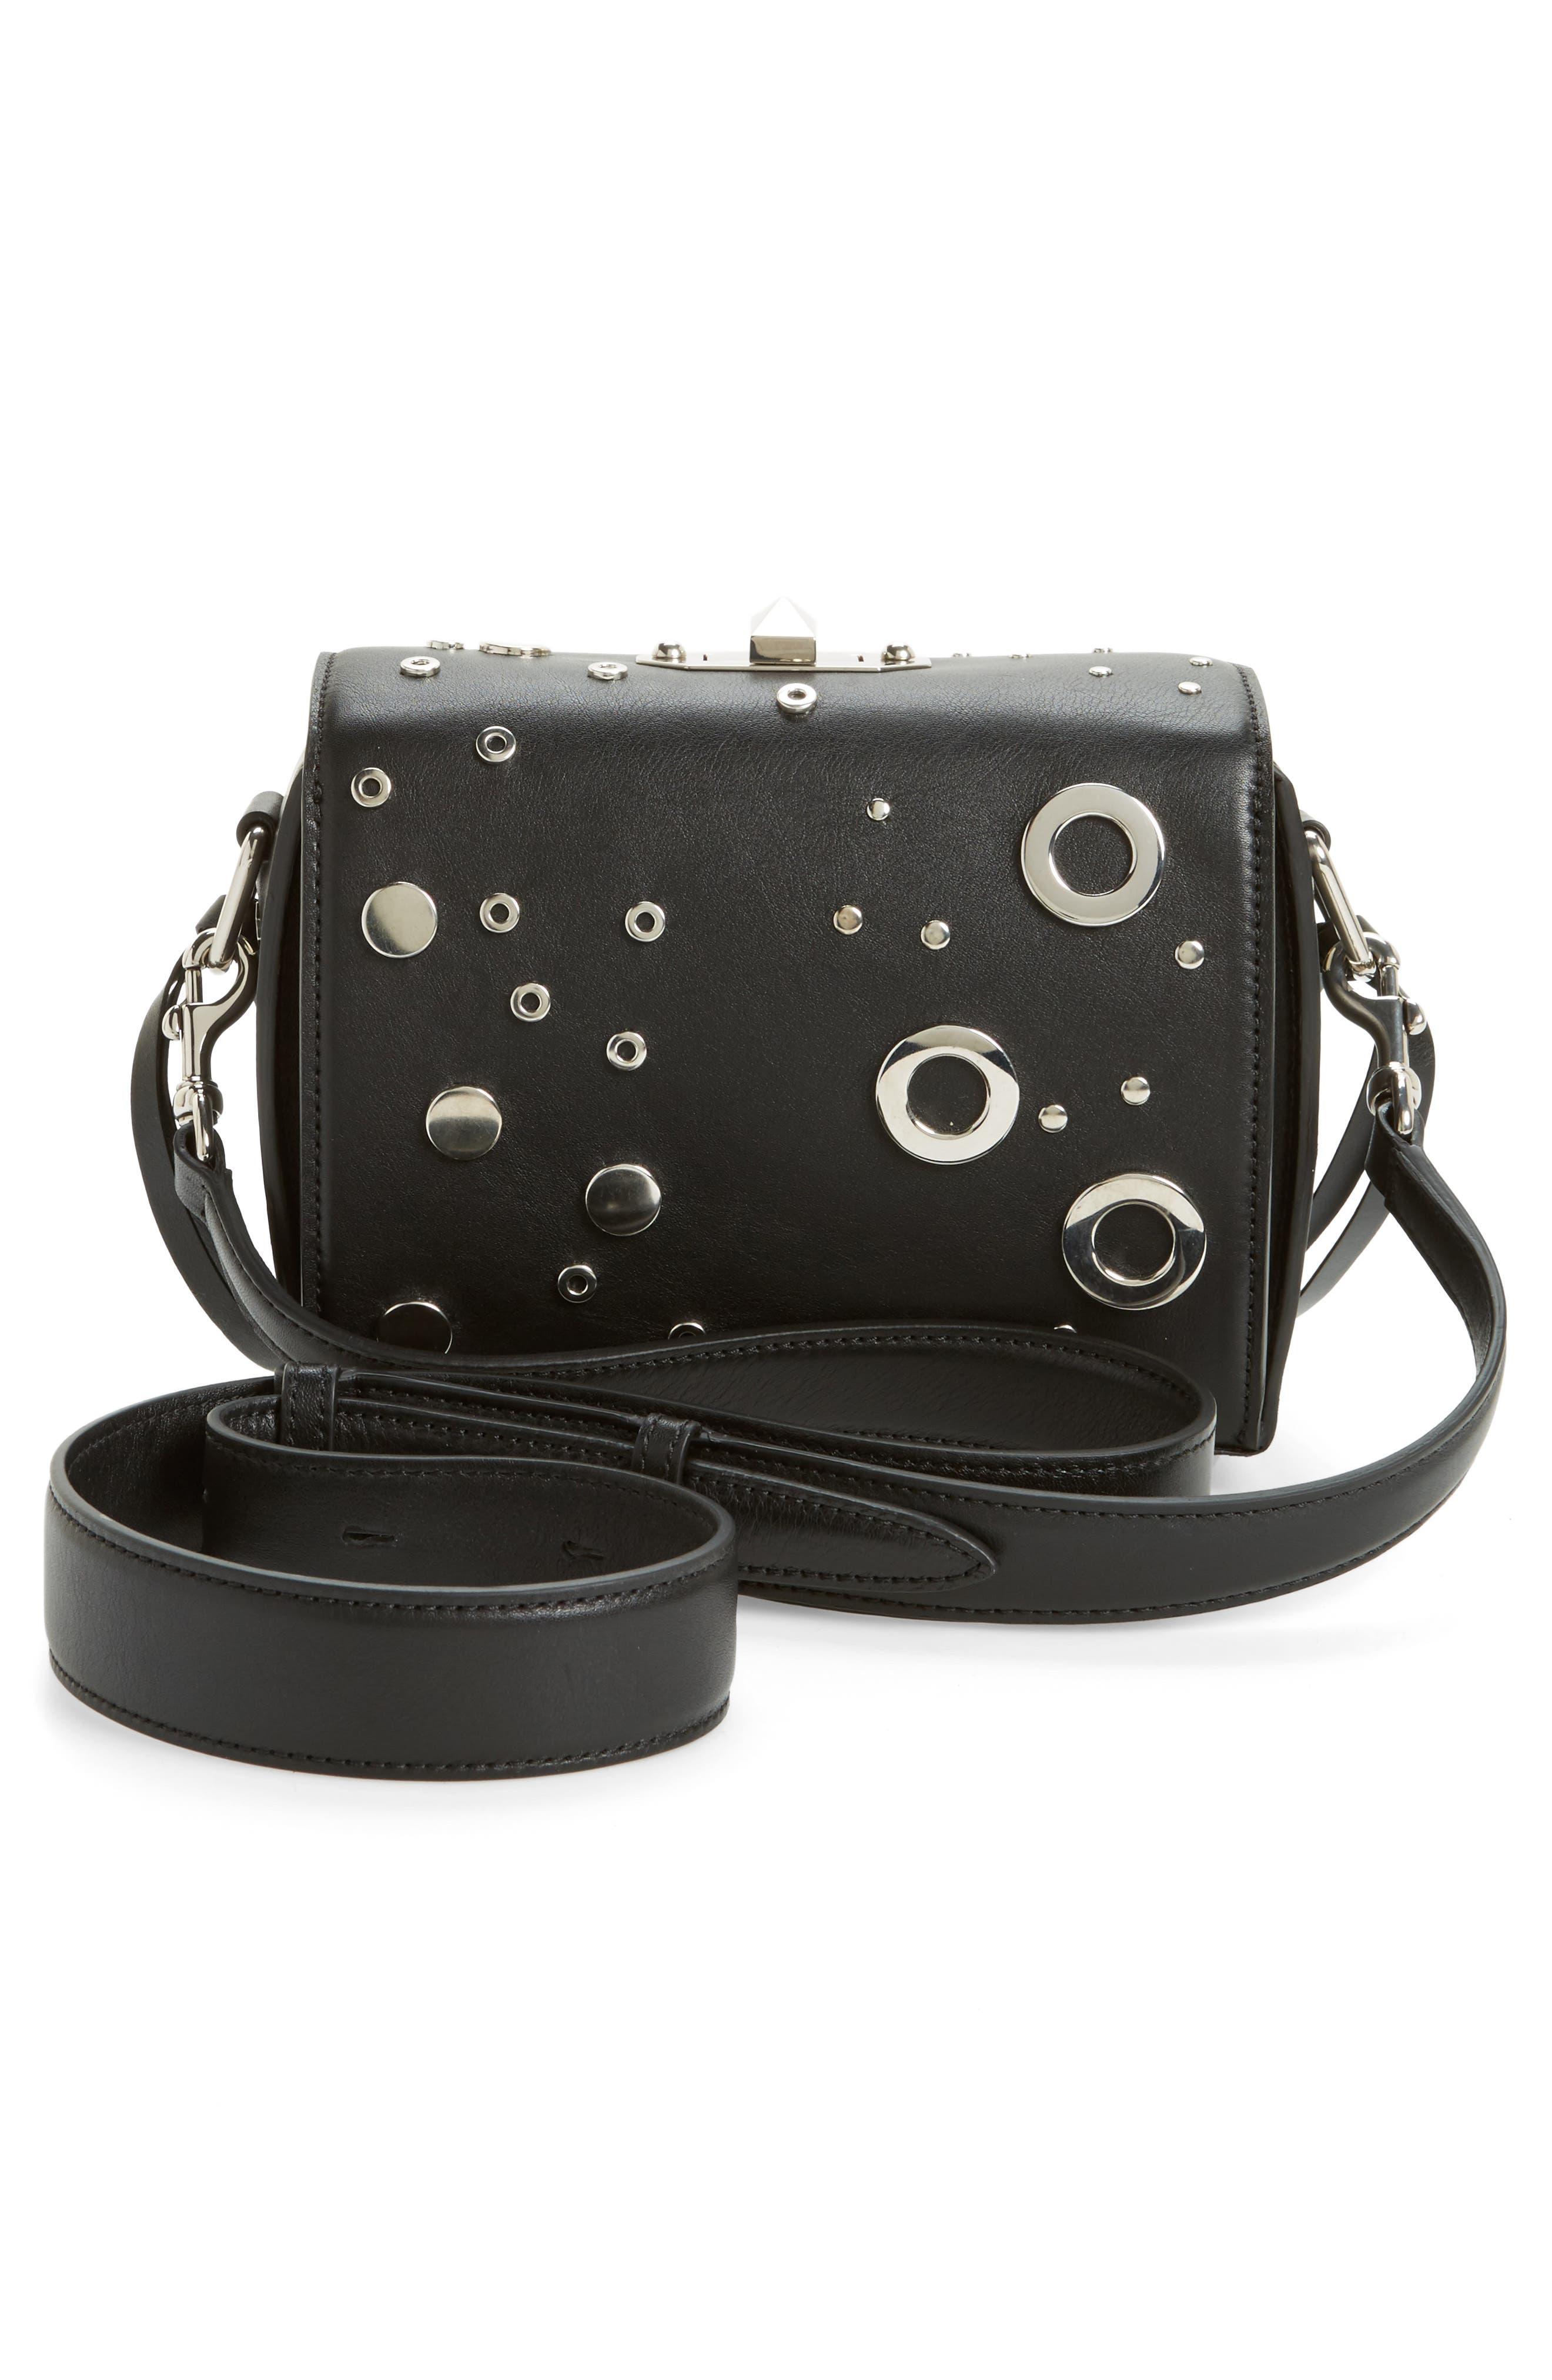 Alternate Image 2  - Alexander McQueen Grommet & Stud Calfskin Leather Box Bag